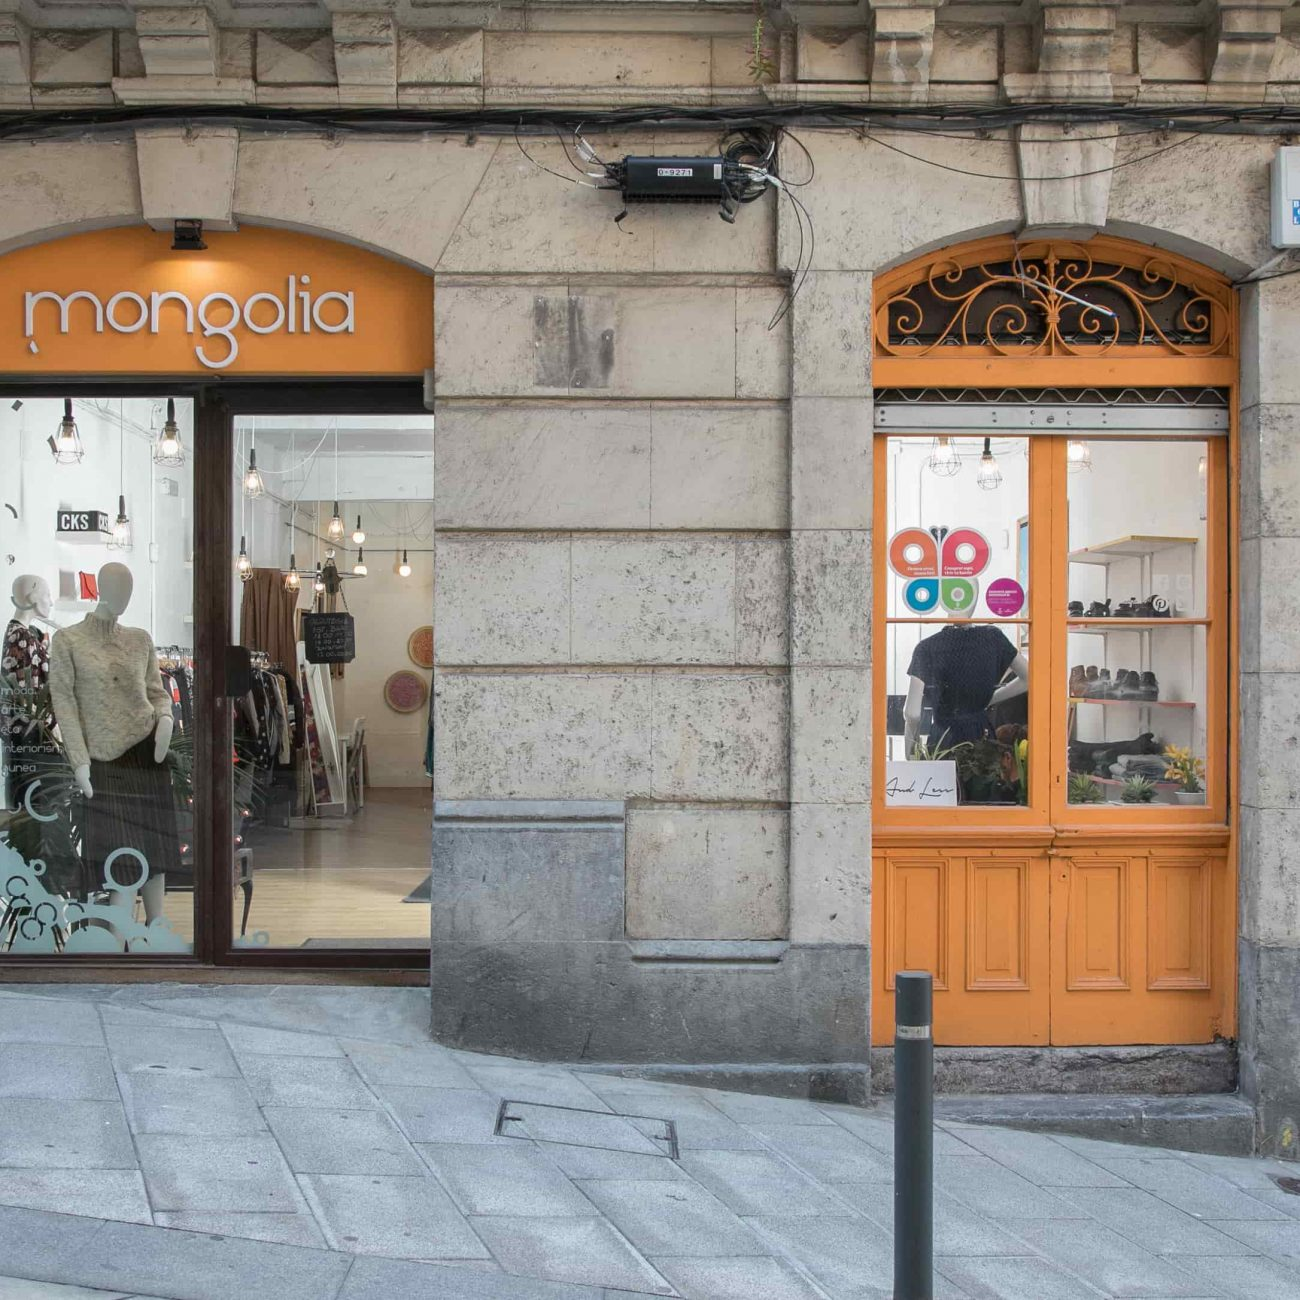 Mongolia, moda y arte en Bilbao